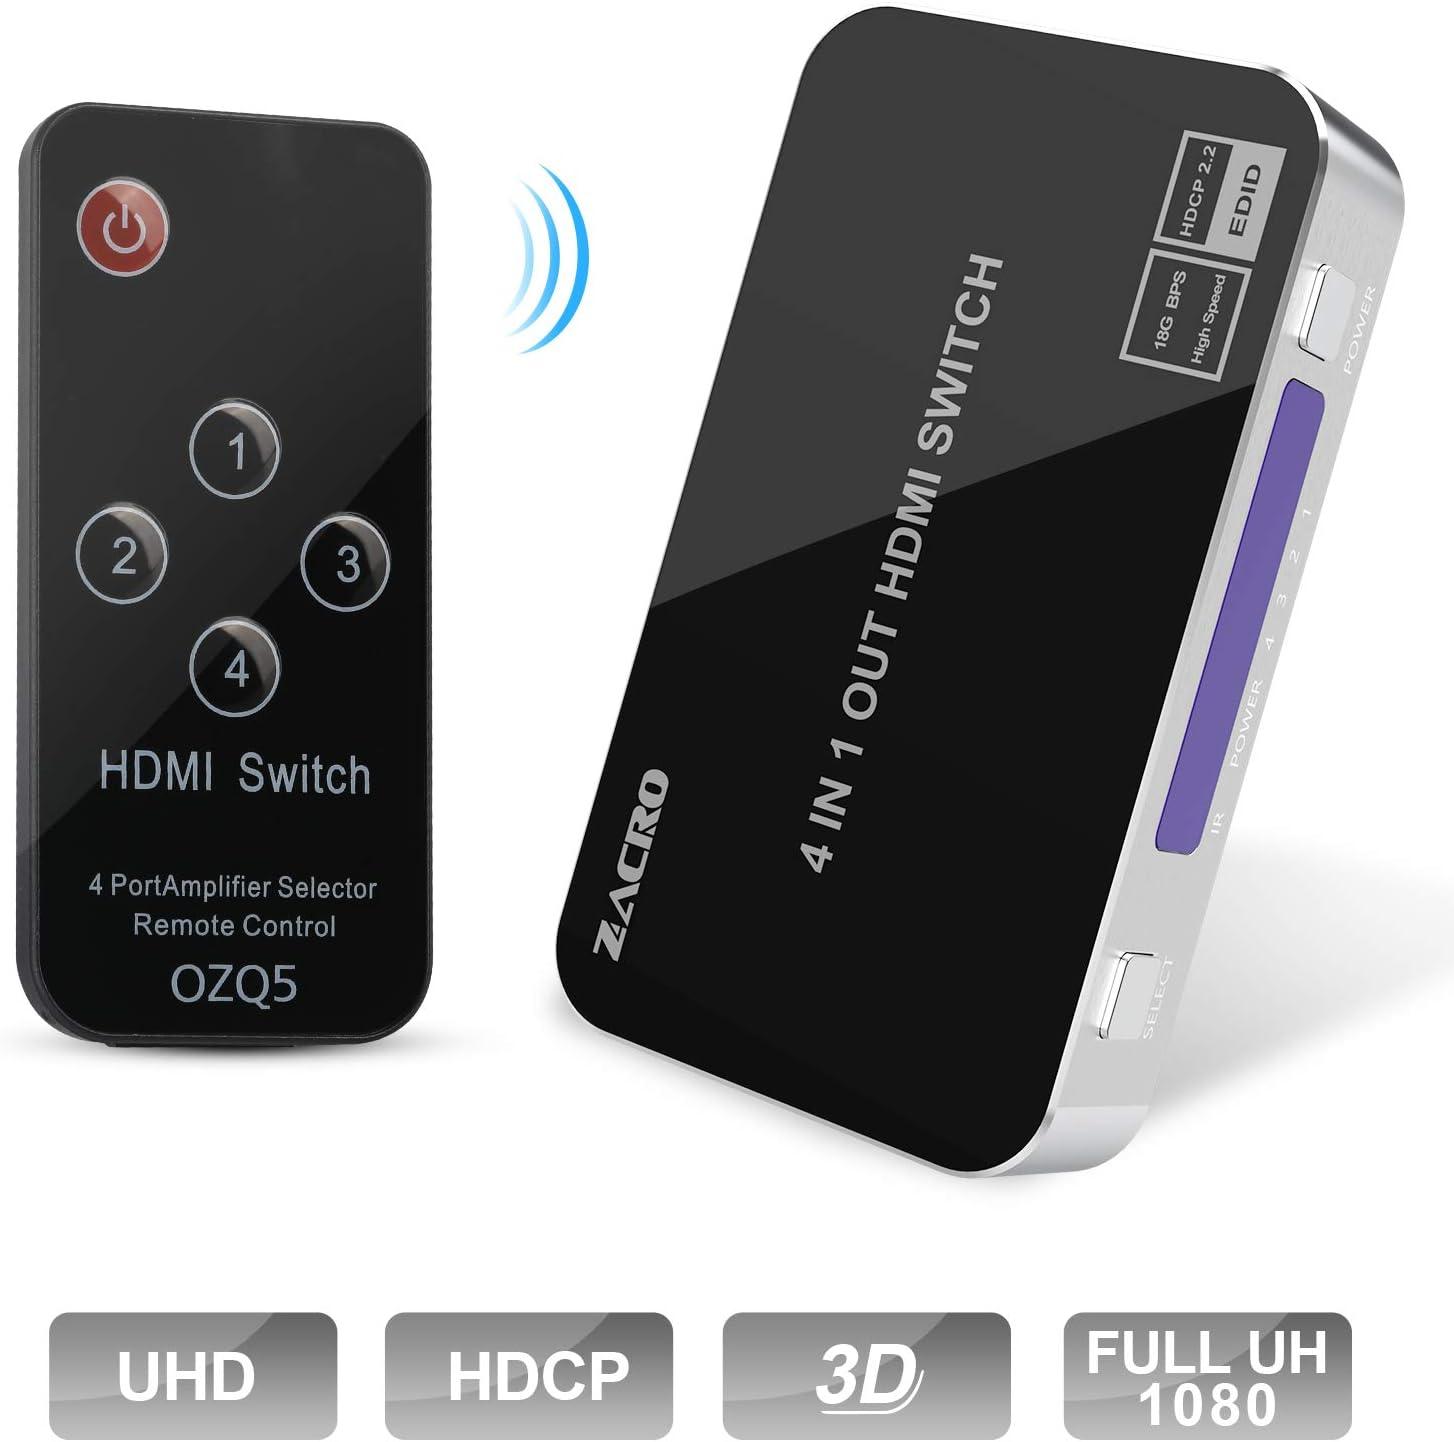 Zacro Switch HDMI 4K para PS4 Xbox Sky Box Fire Stick//reproductor DVD//proyector HDTV soporta 4K 3D 1080P HD divisor HDMI 4 en 1 etc.